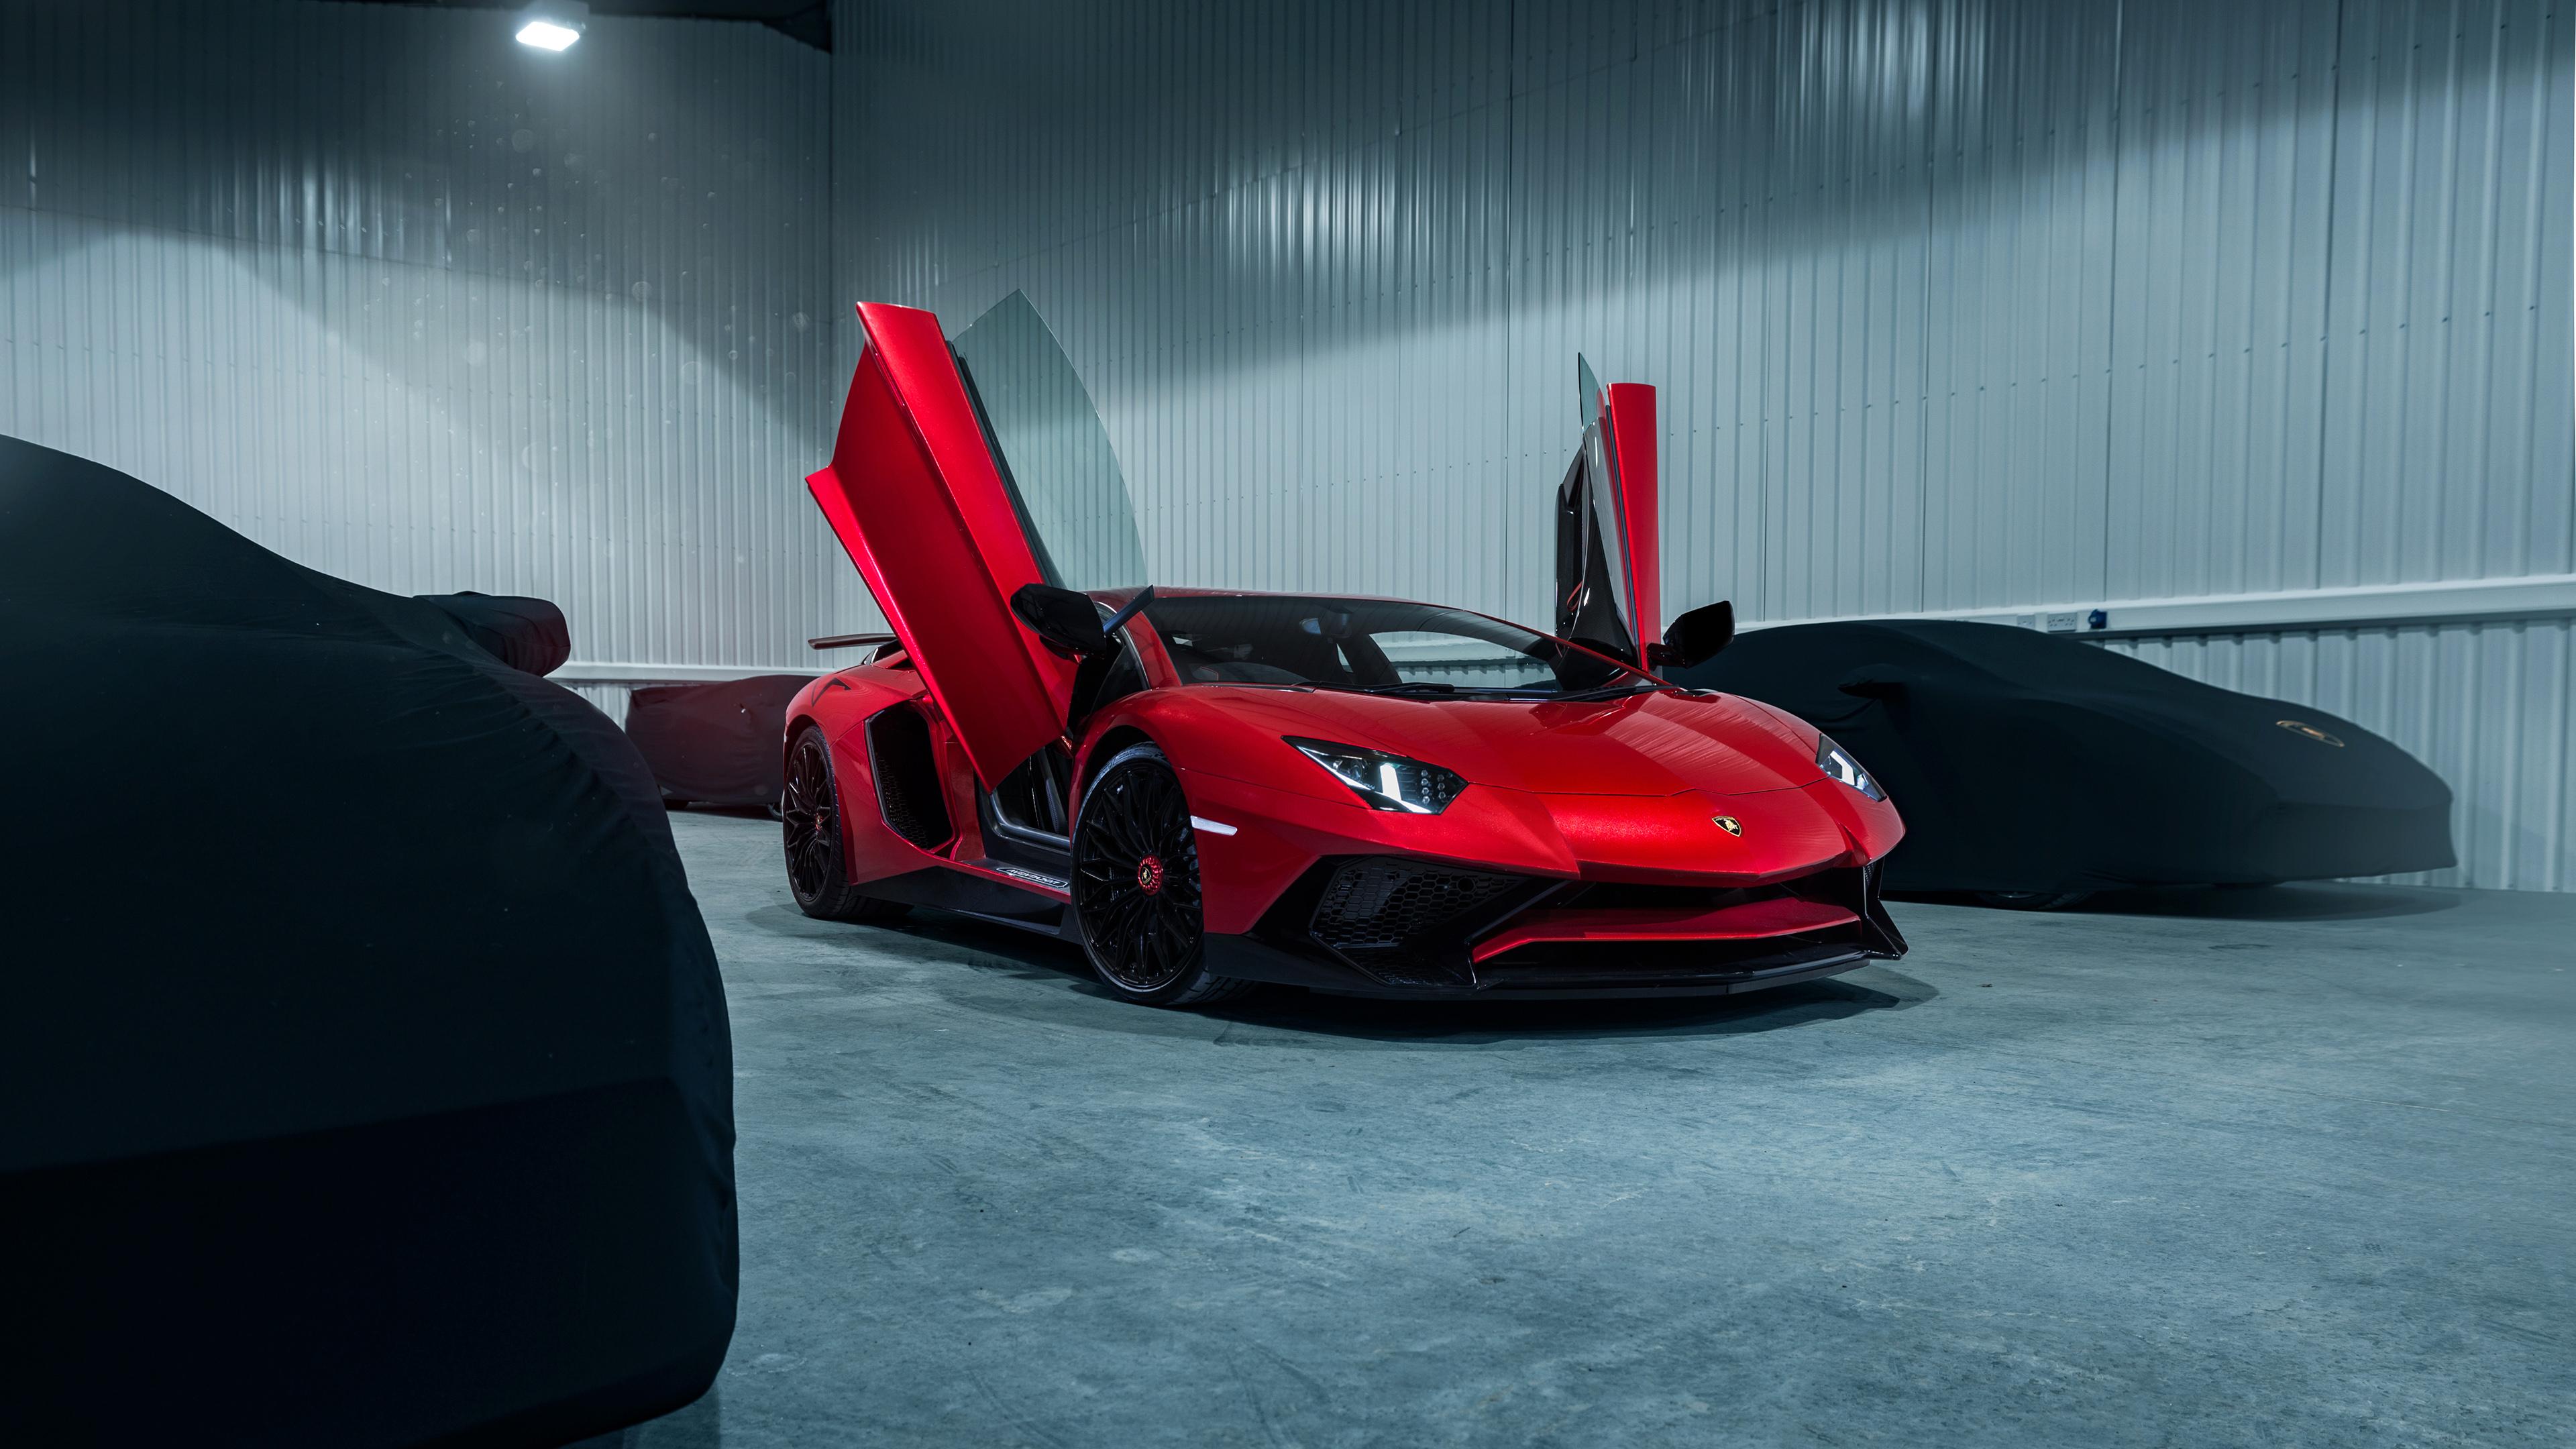 Lamborghini Aventador Sv 4k Wallpaper Hd Car Wallpapers Id 14001